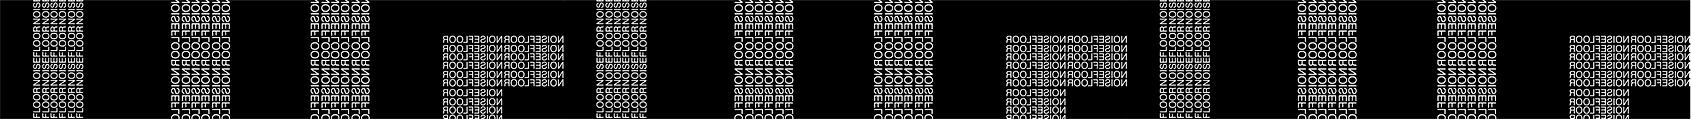 NF-Website-BannerLONGFixed.png